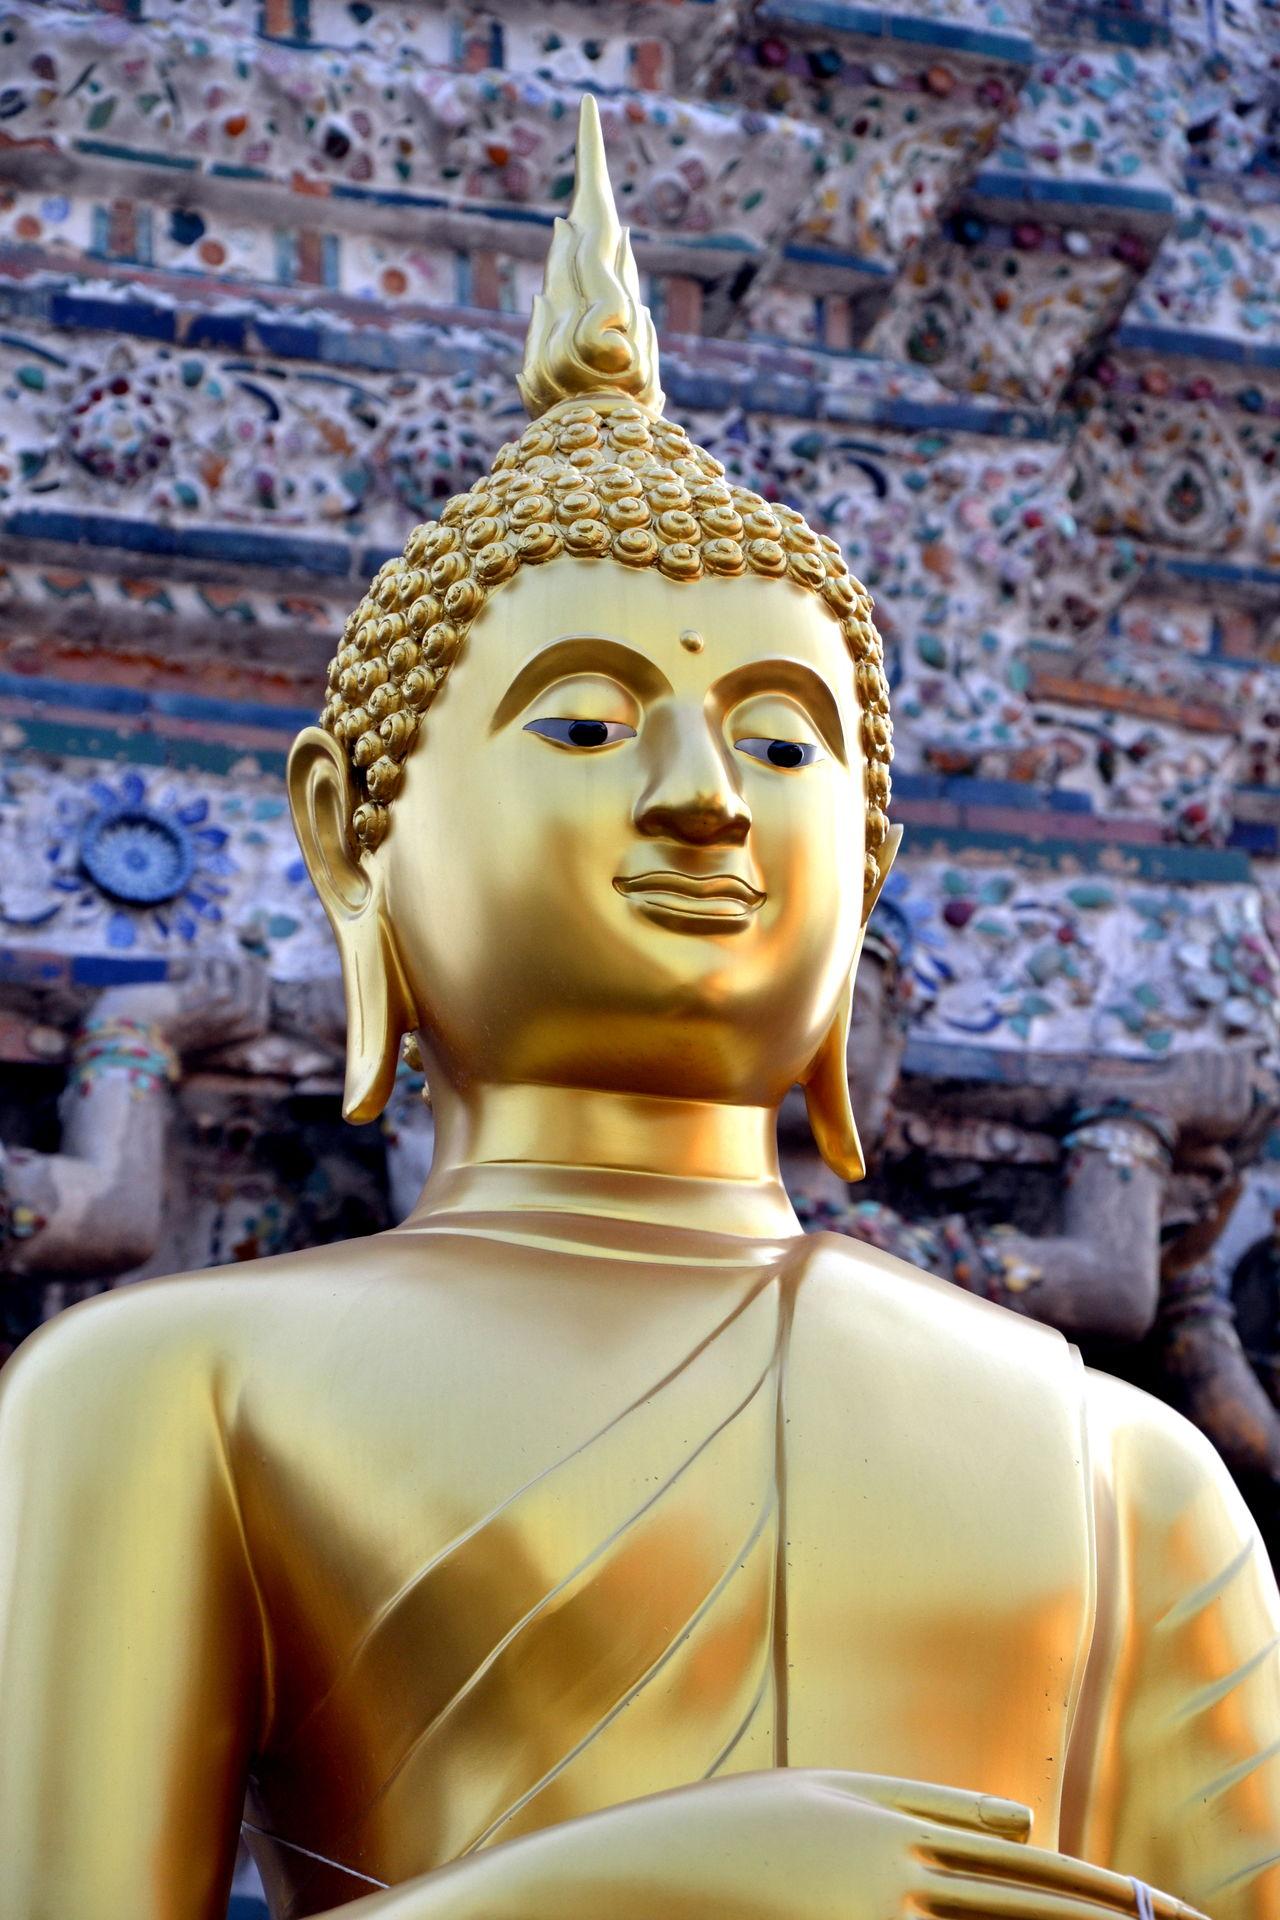 Buddha Buddhism Buddhist Temple Day Gold Colored Golden Color Grand Palace Bangkok Thailand Human Representation Idol Male Likeness No People Religion Sculpture Spirituality Statue